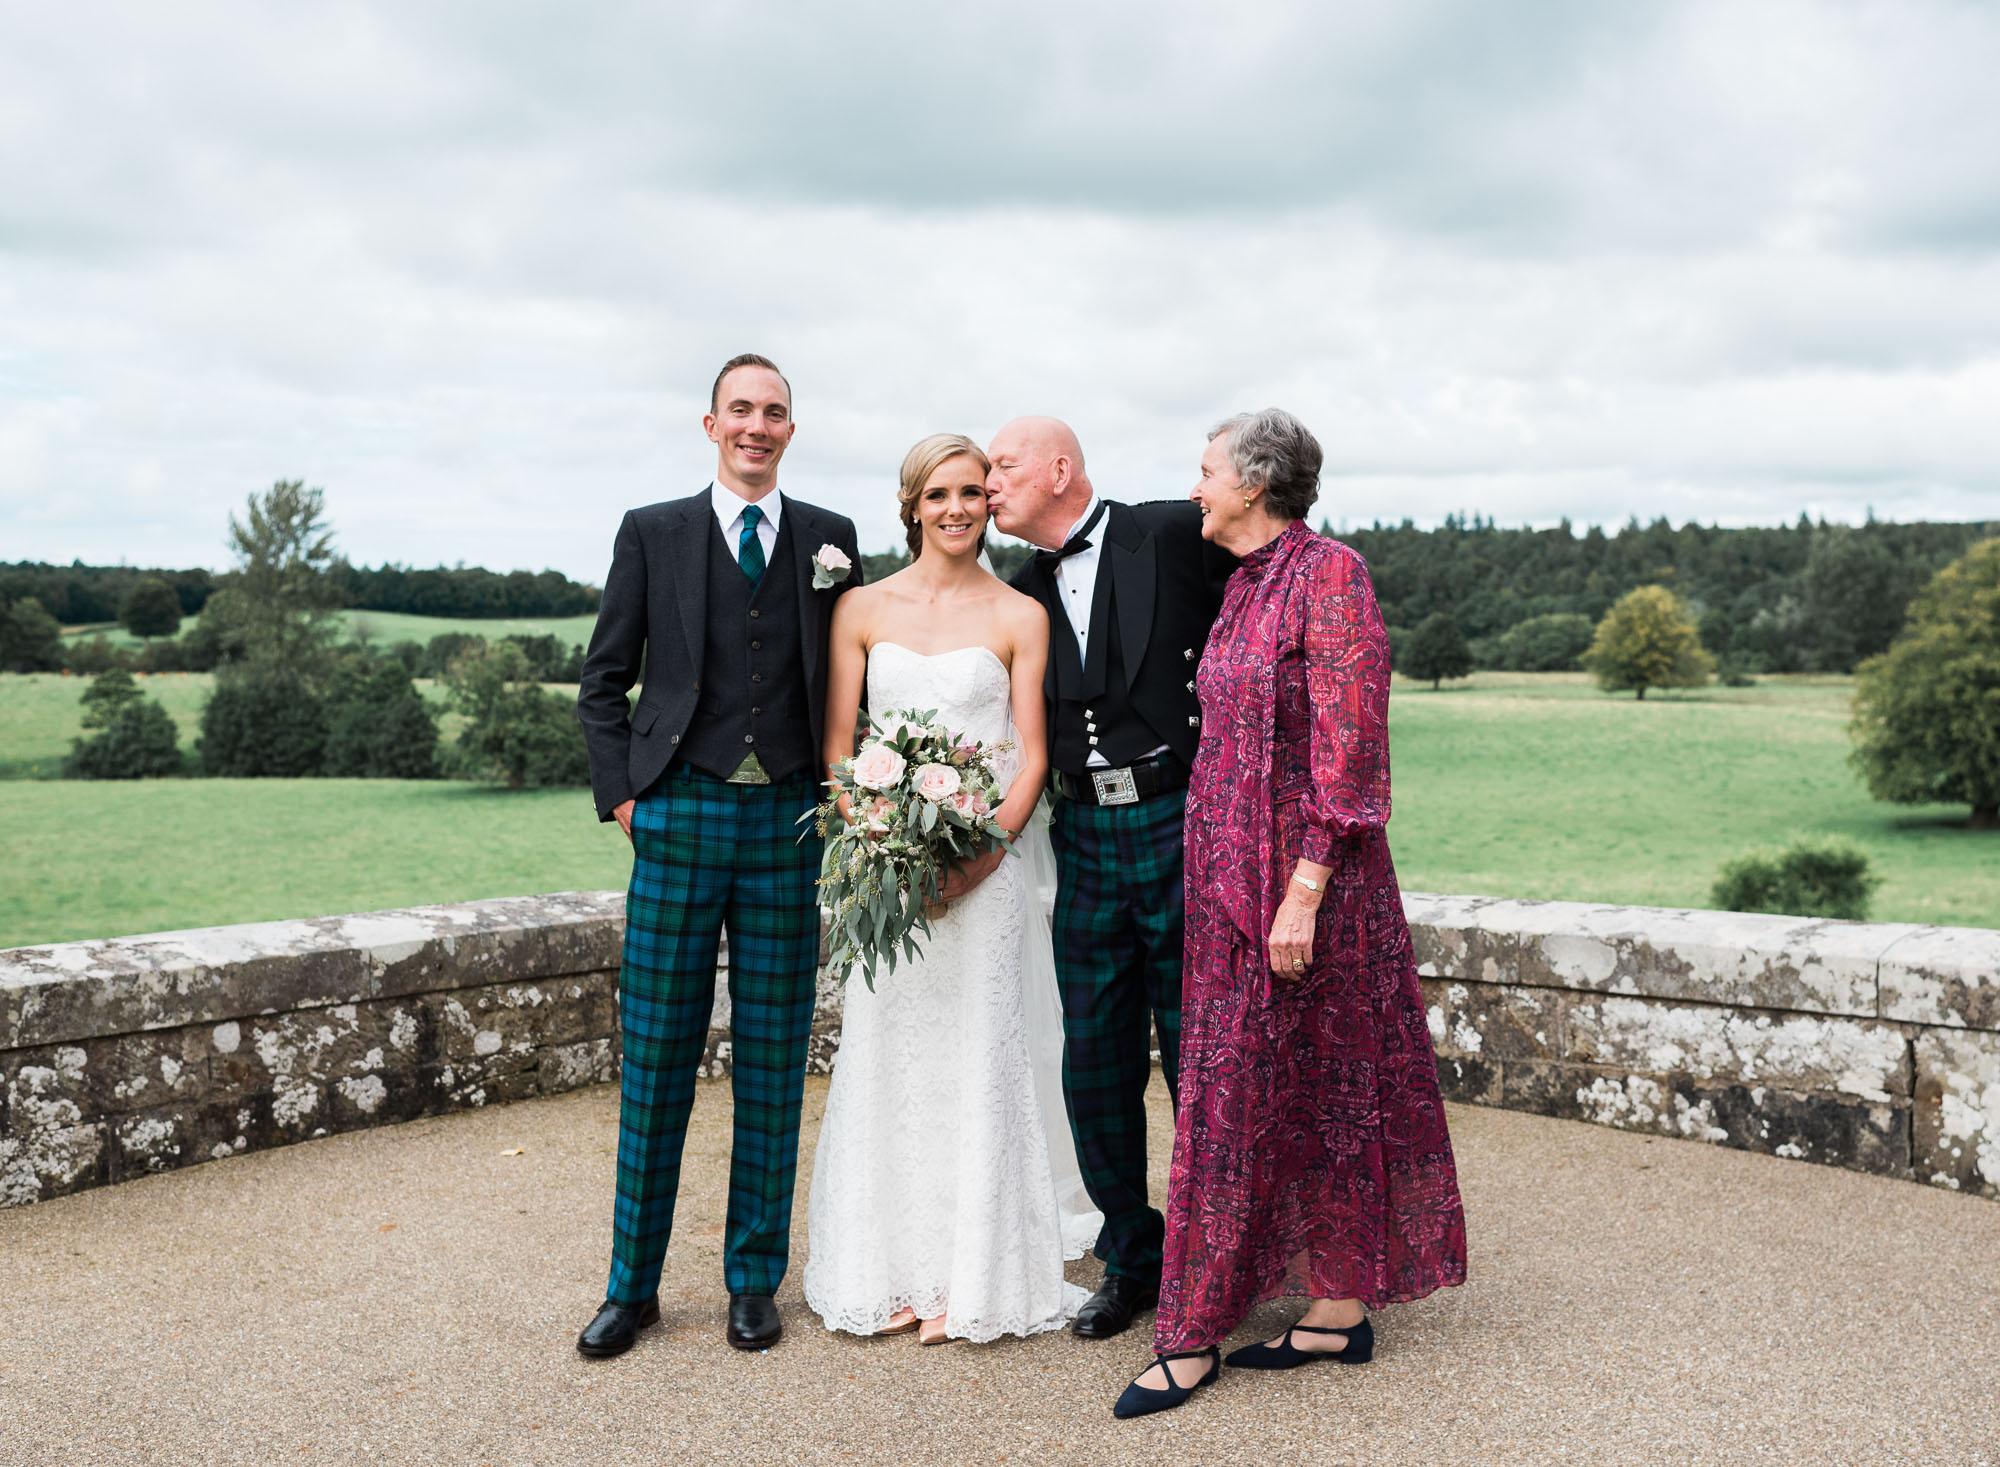 scottish_wedding_blairquhan_castle-73.jpg